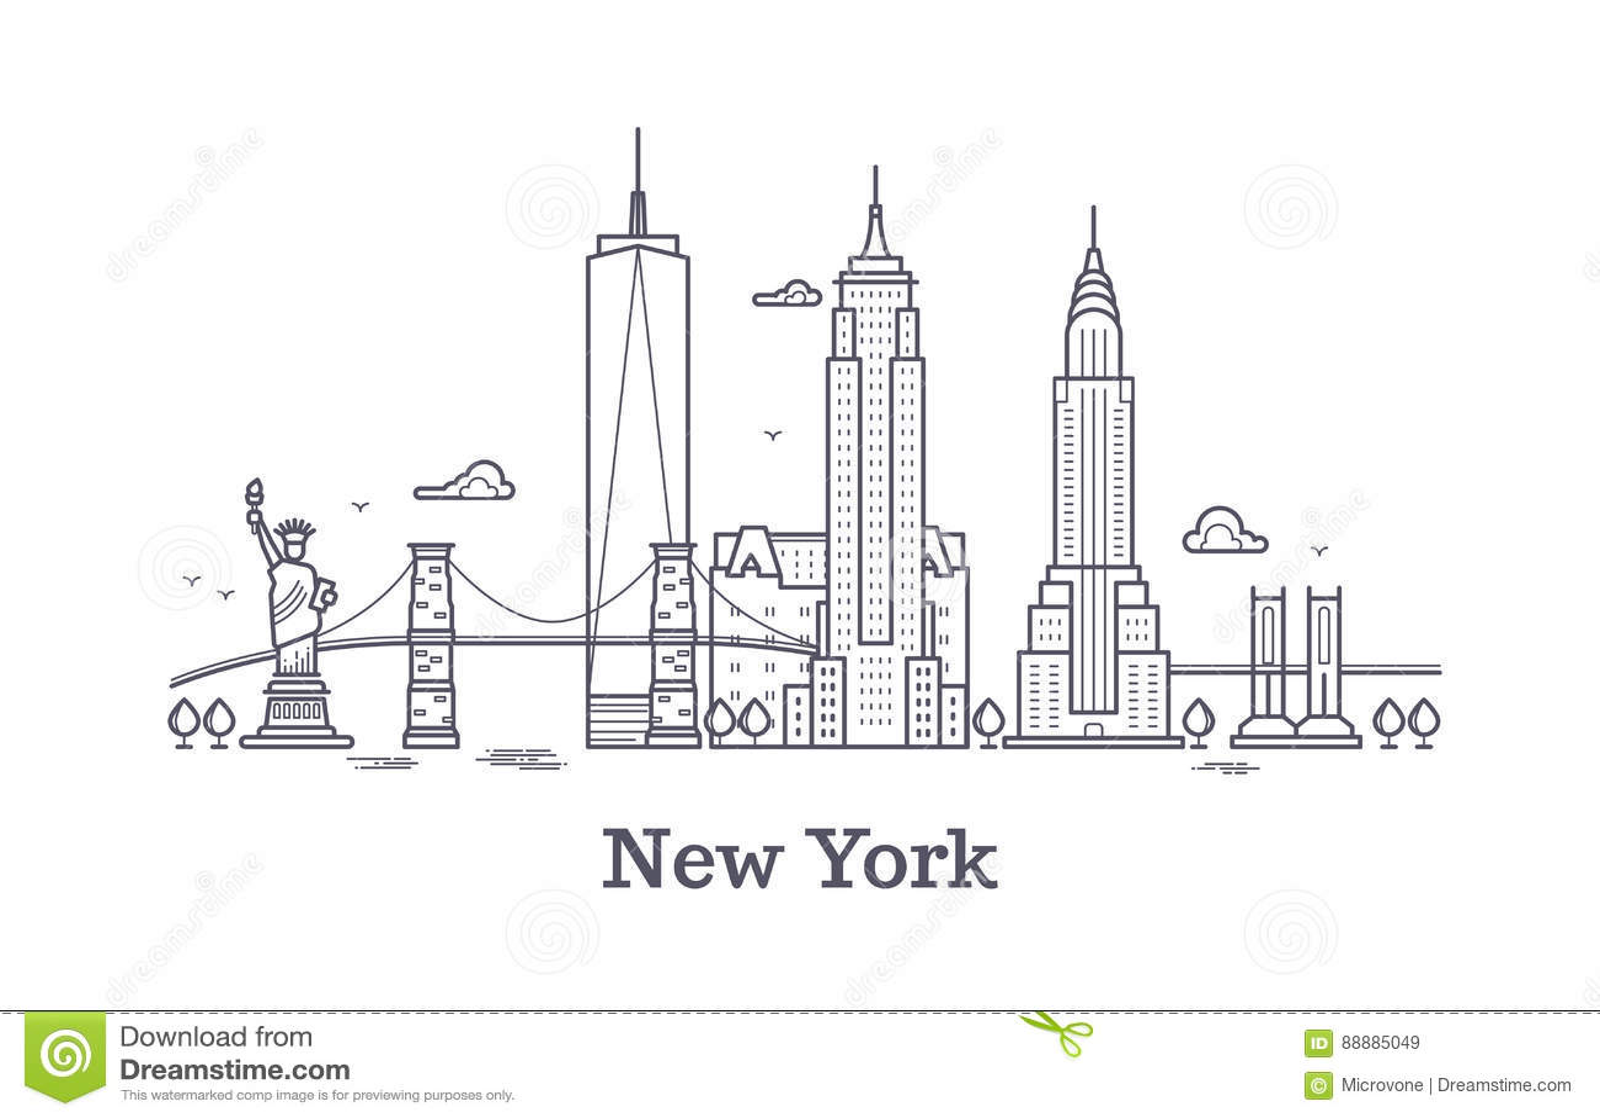 New York Cityentwurfsskyline Nyc Linie Schattenbild Usa